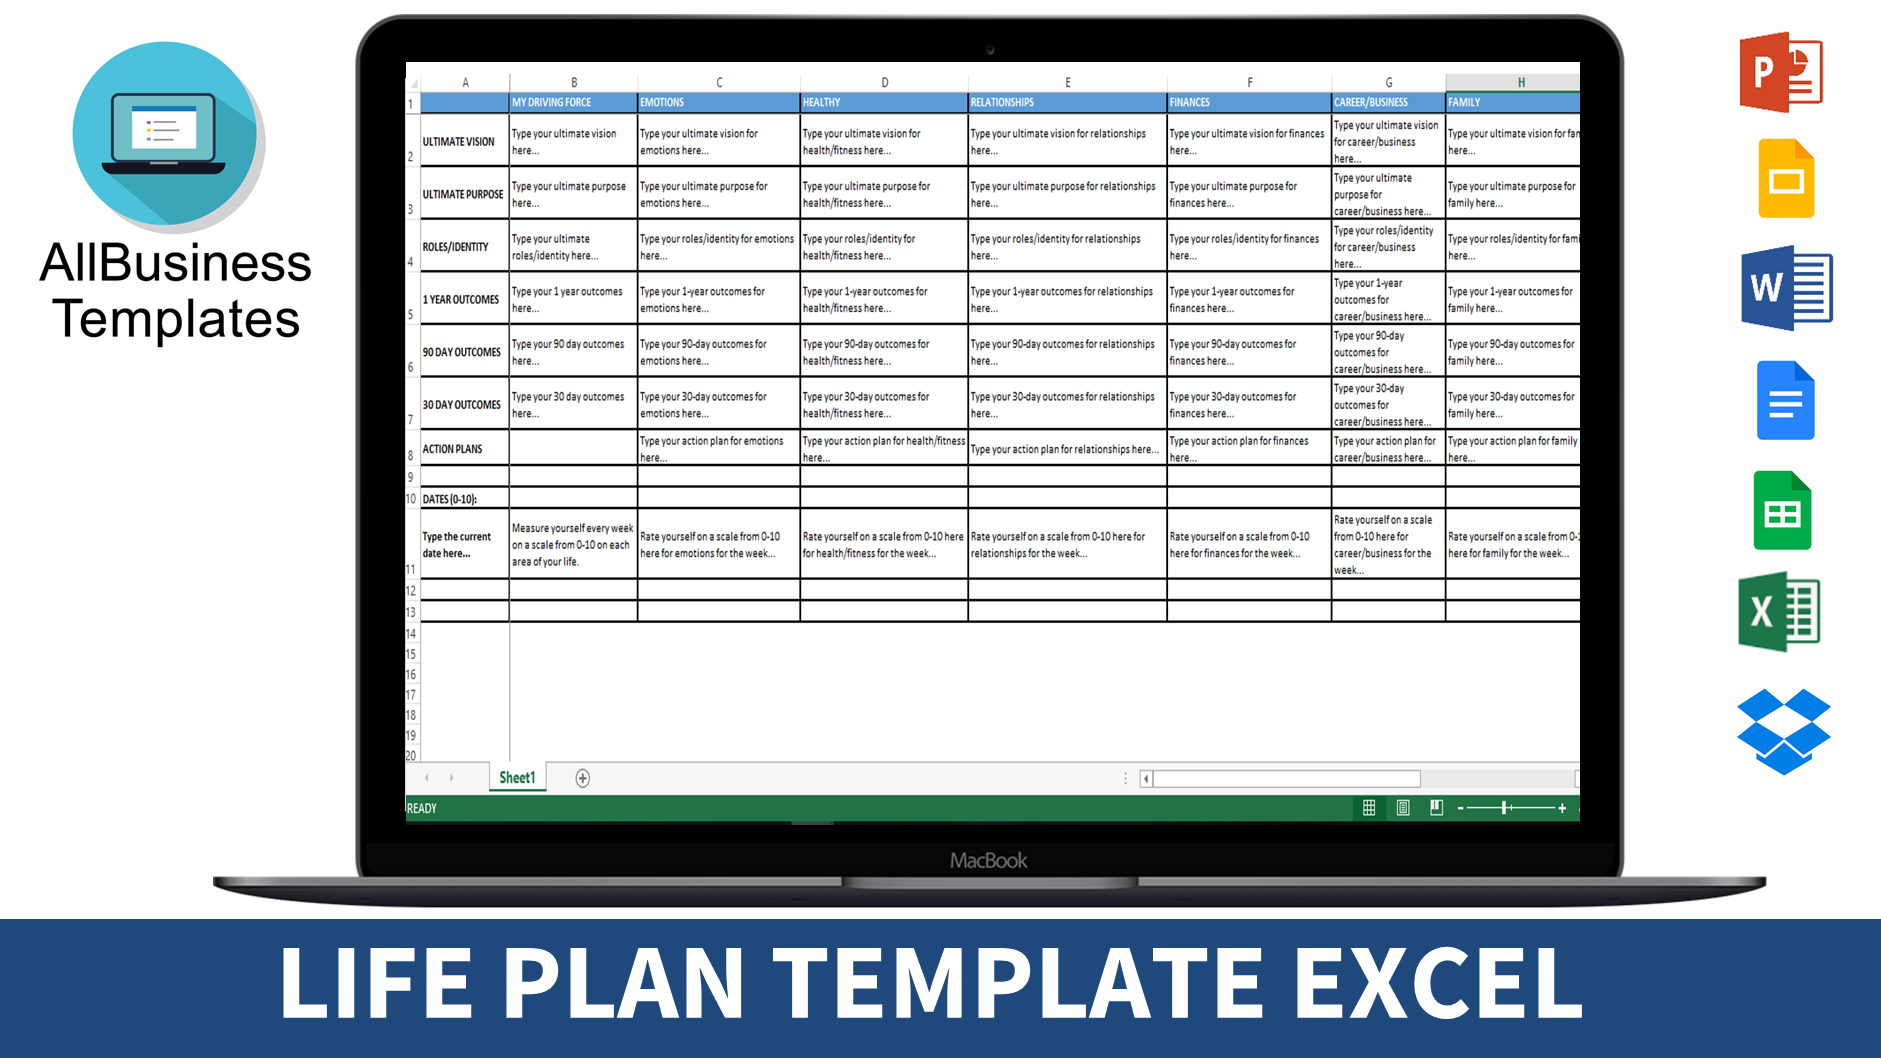 Strategic Life Plan Vision Templates At Allbusinesstemplates Com